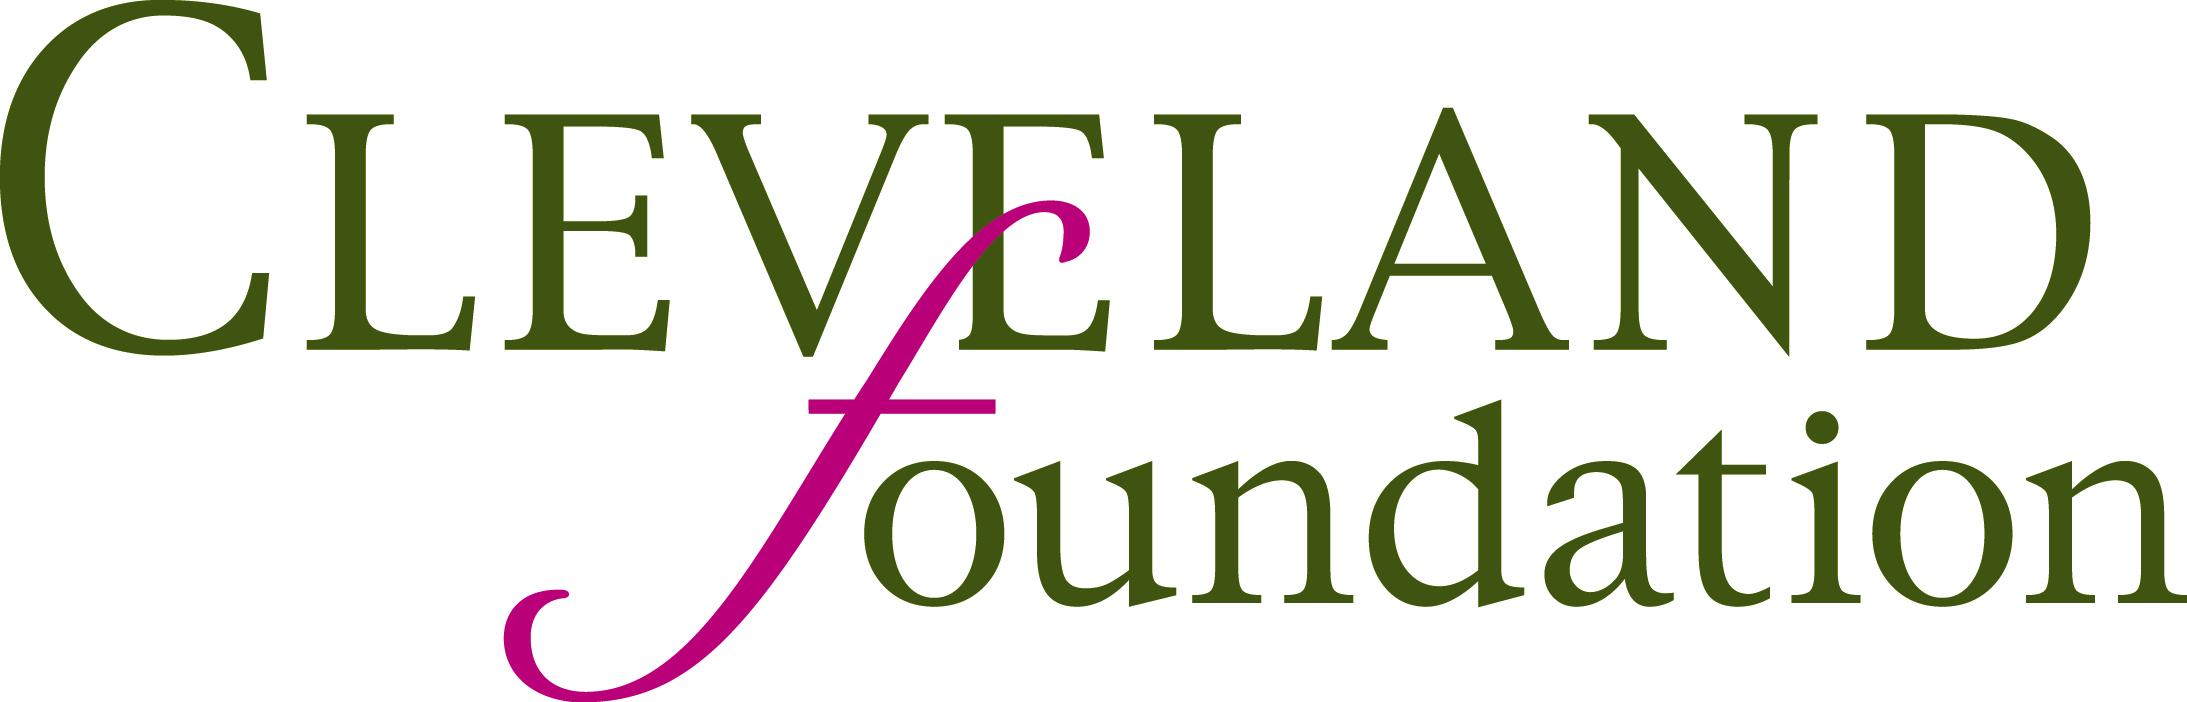 Cleveland Foundation logo color 03.02.15